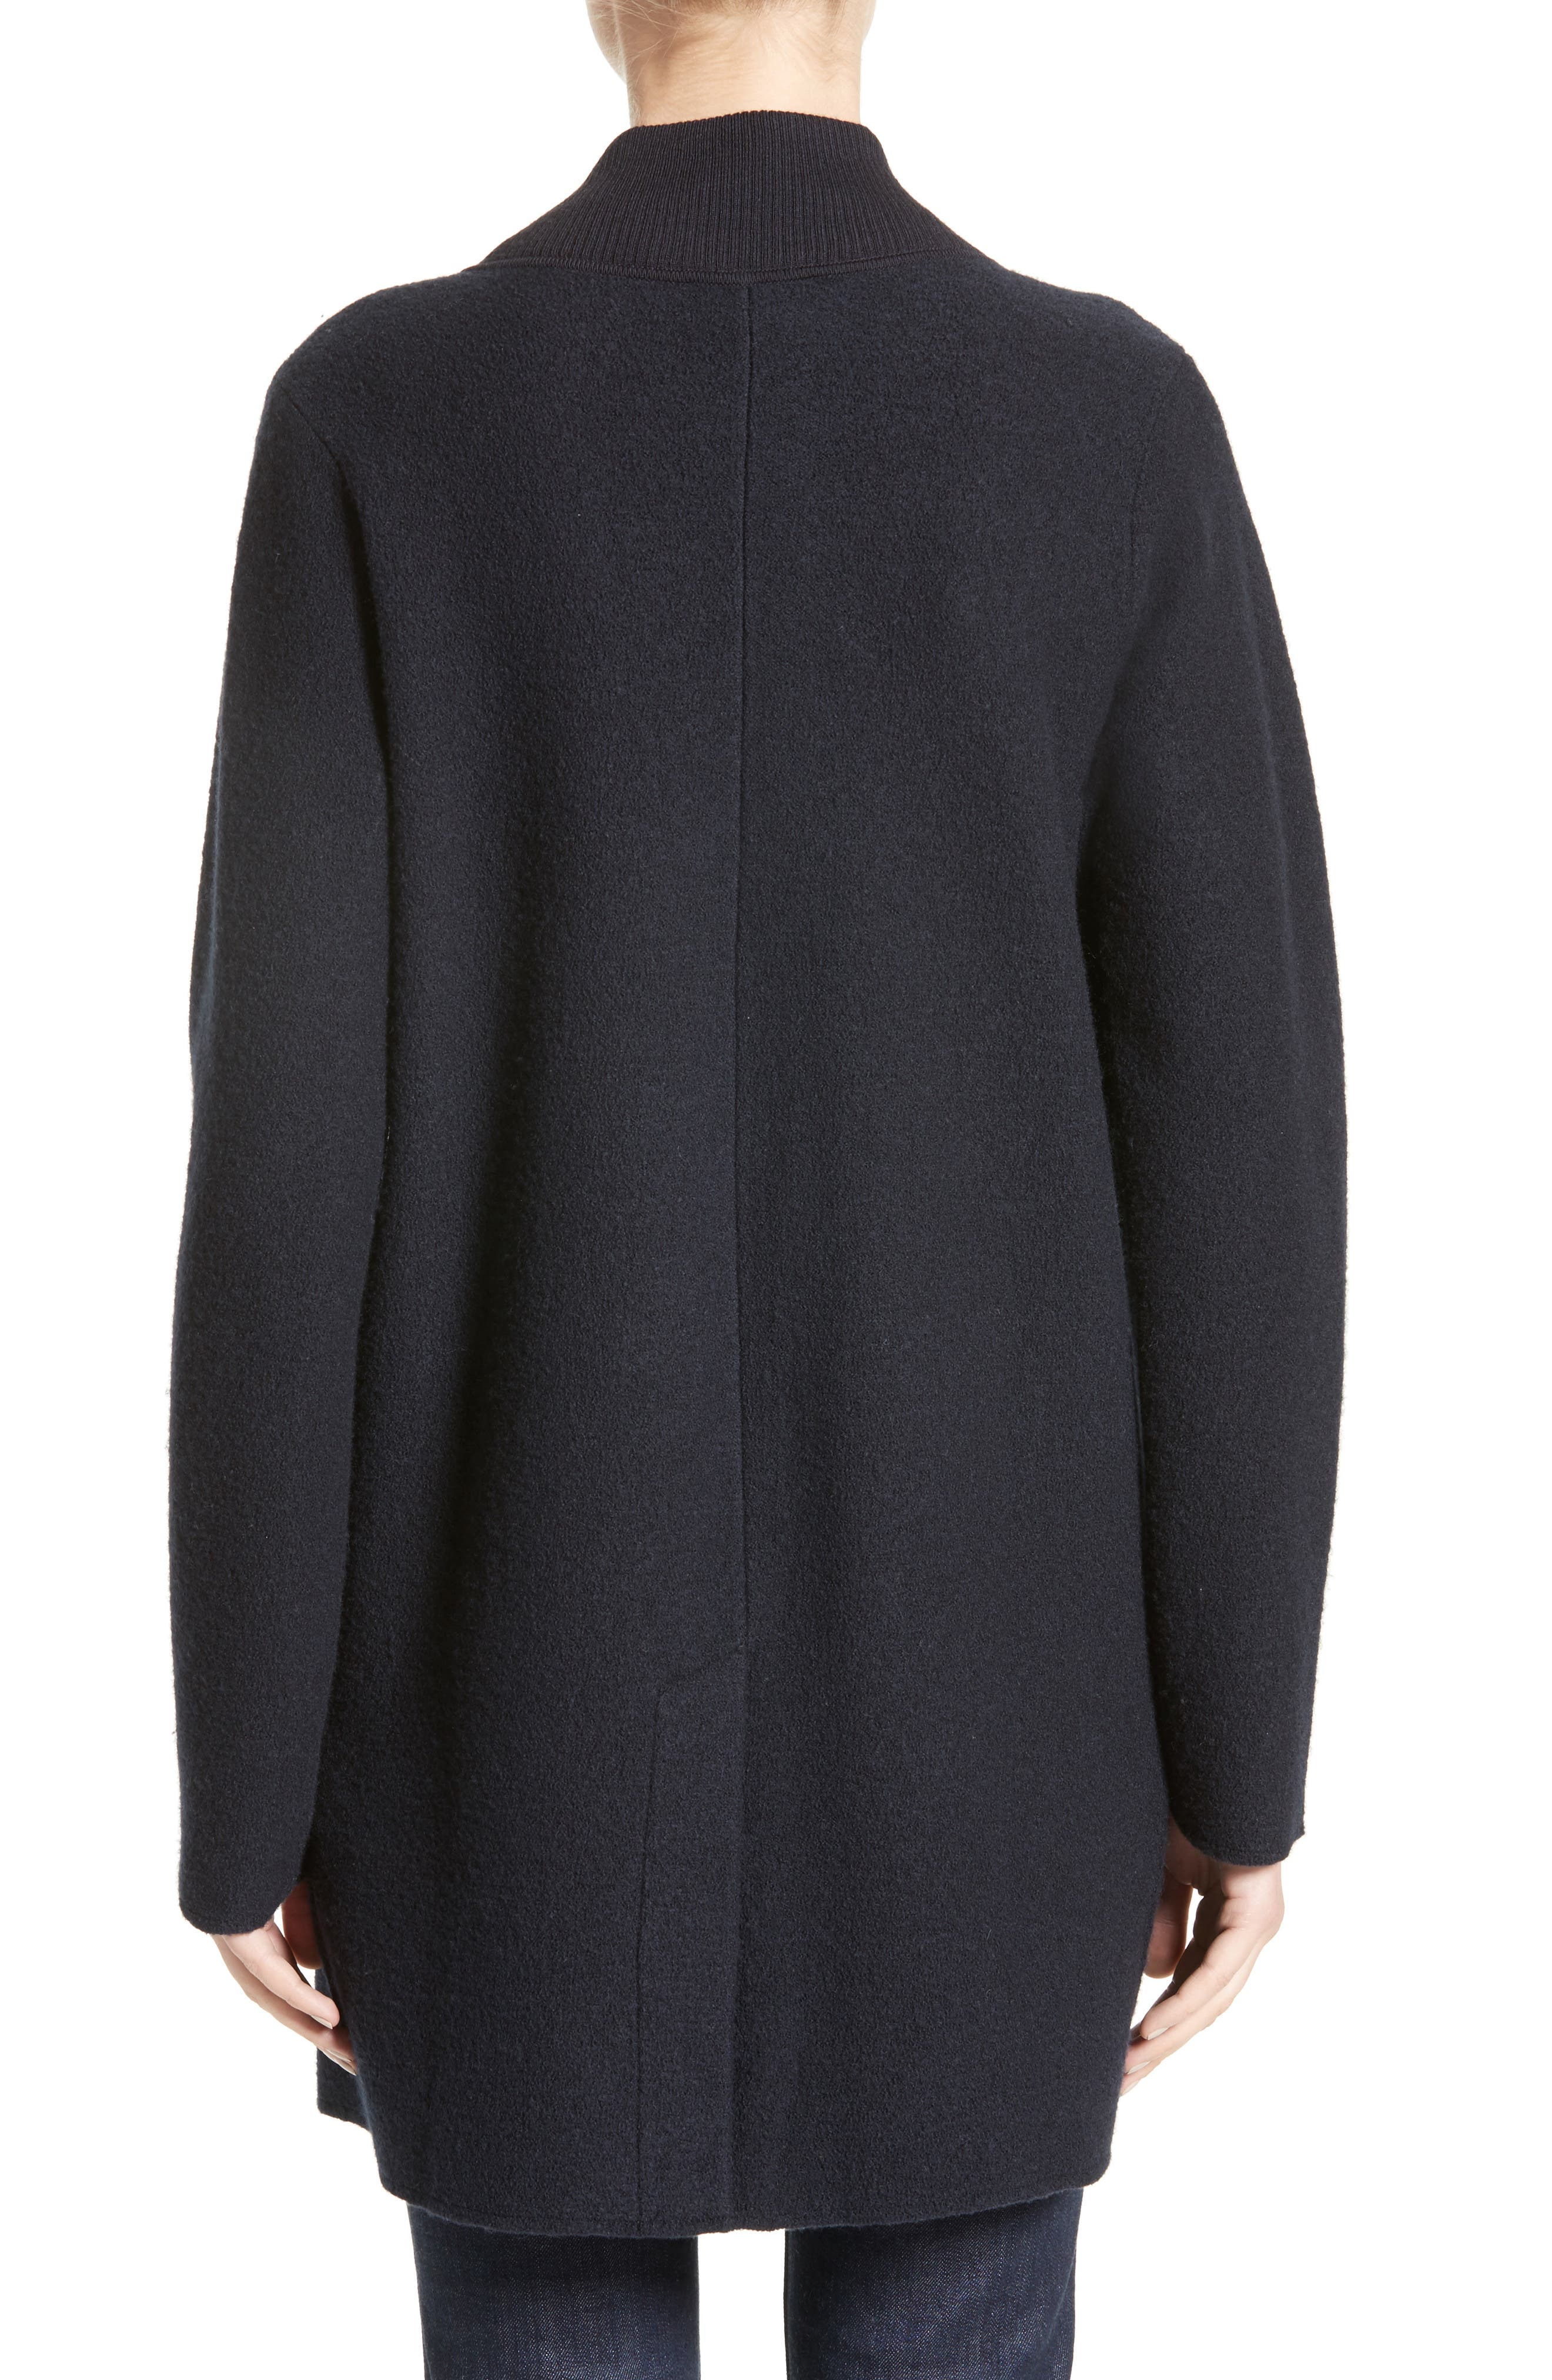 Armani Jeans Single Button Wool Coat,                             Alternate thumbnail 2, color,                             484